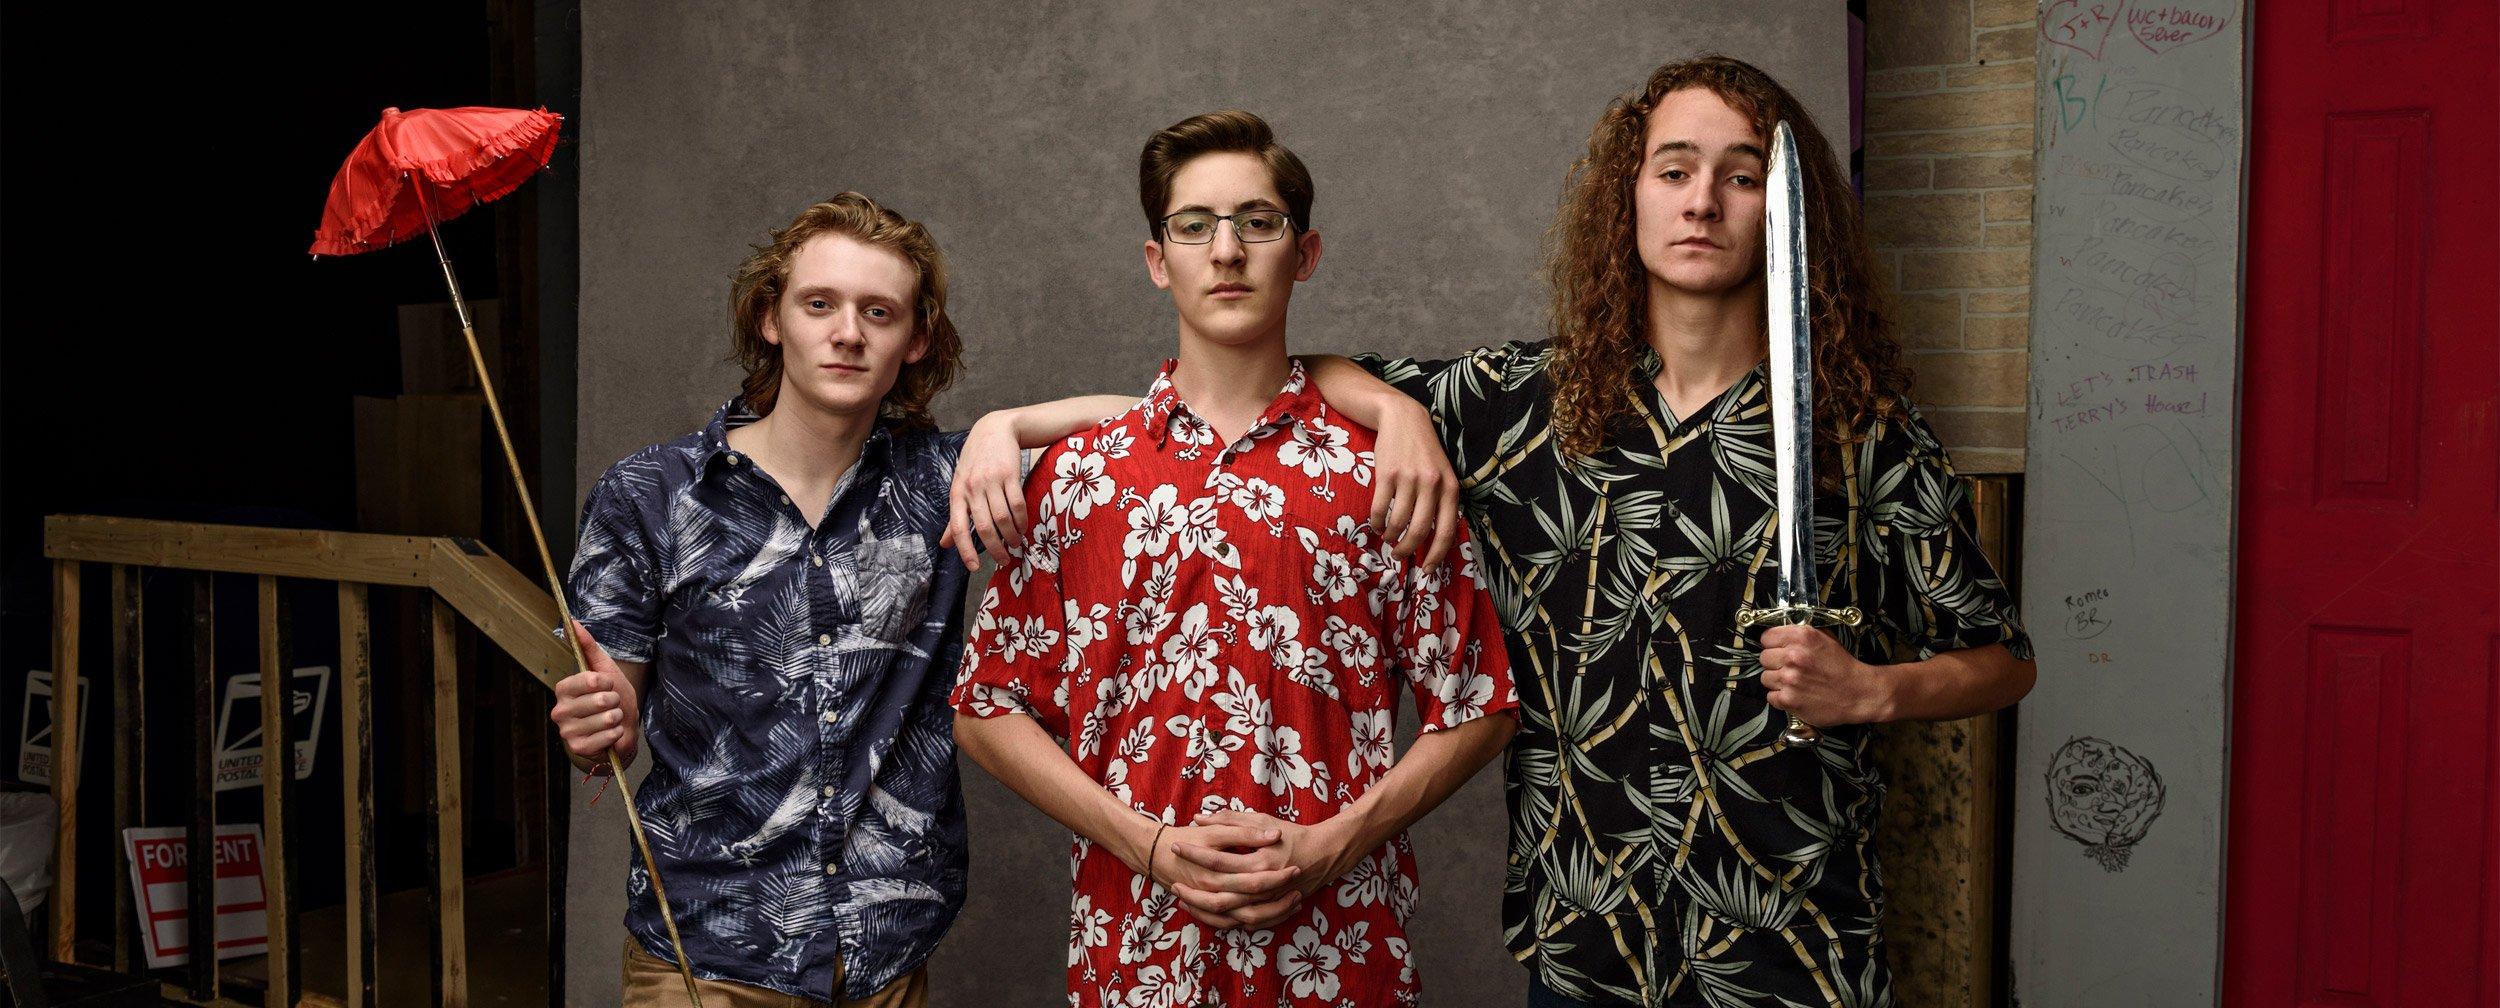 mckinney high school senior theater program students